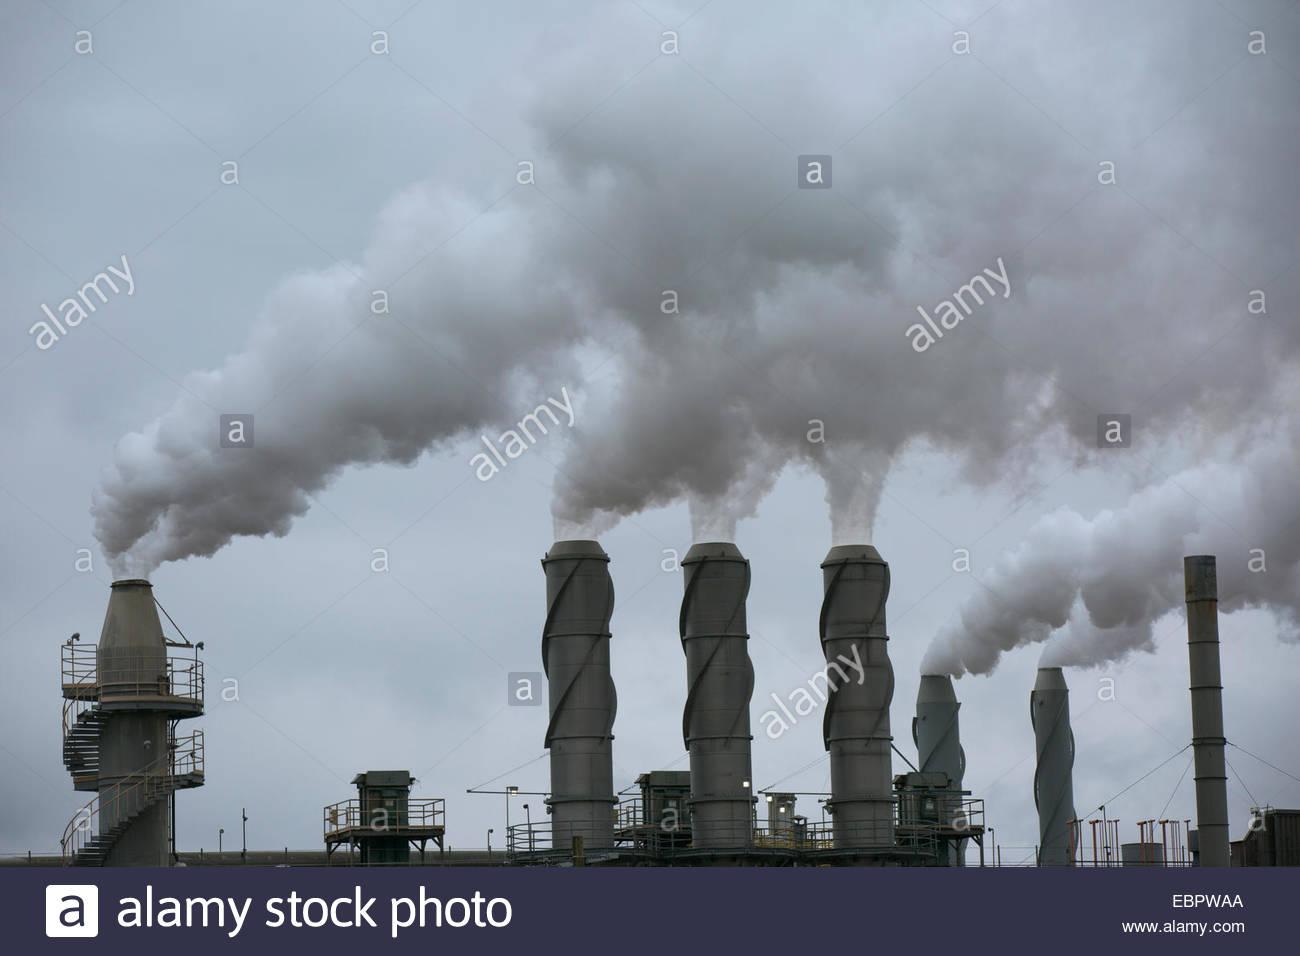 Smoke emitting from smokestacks Stock Photo